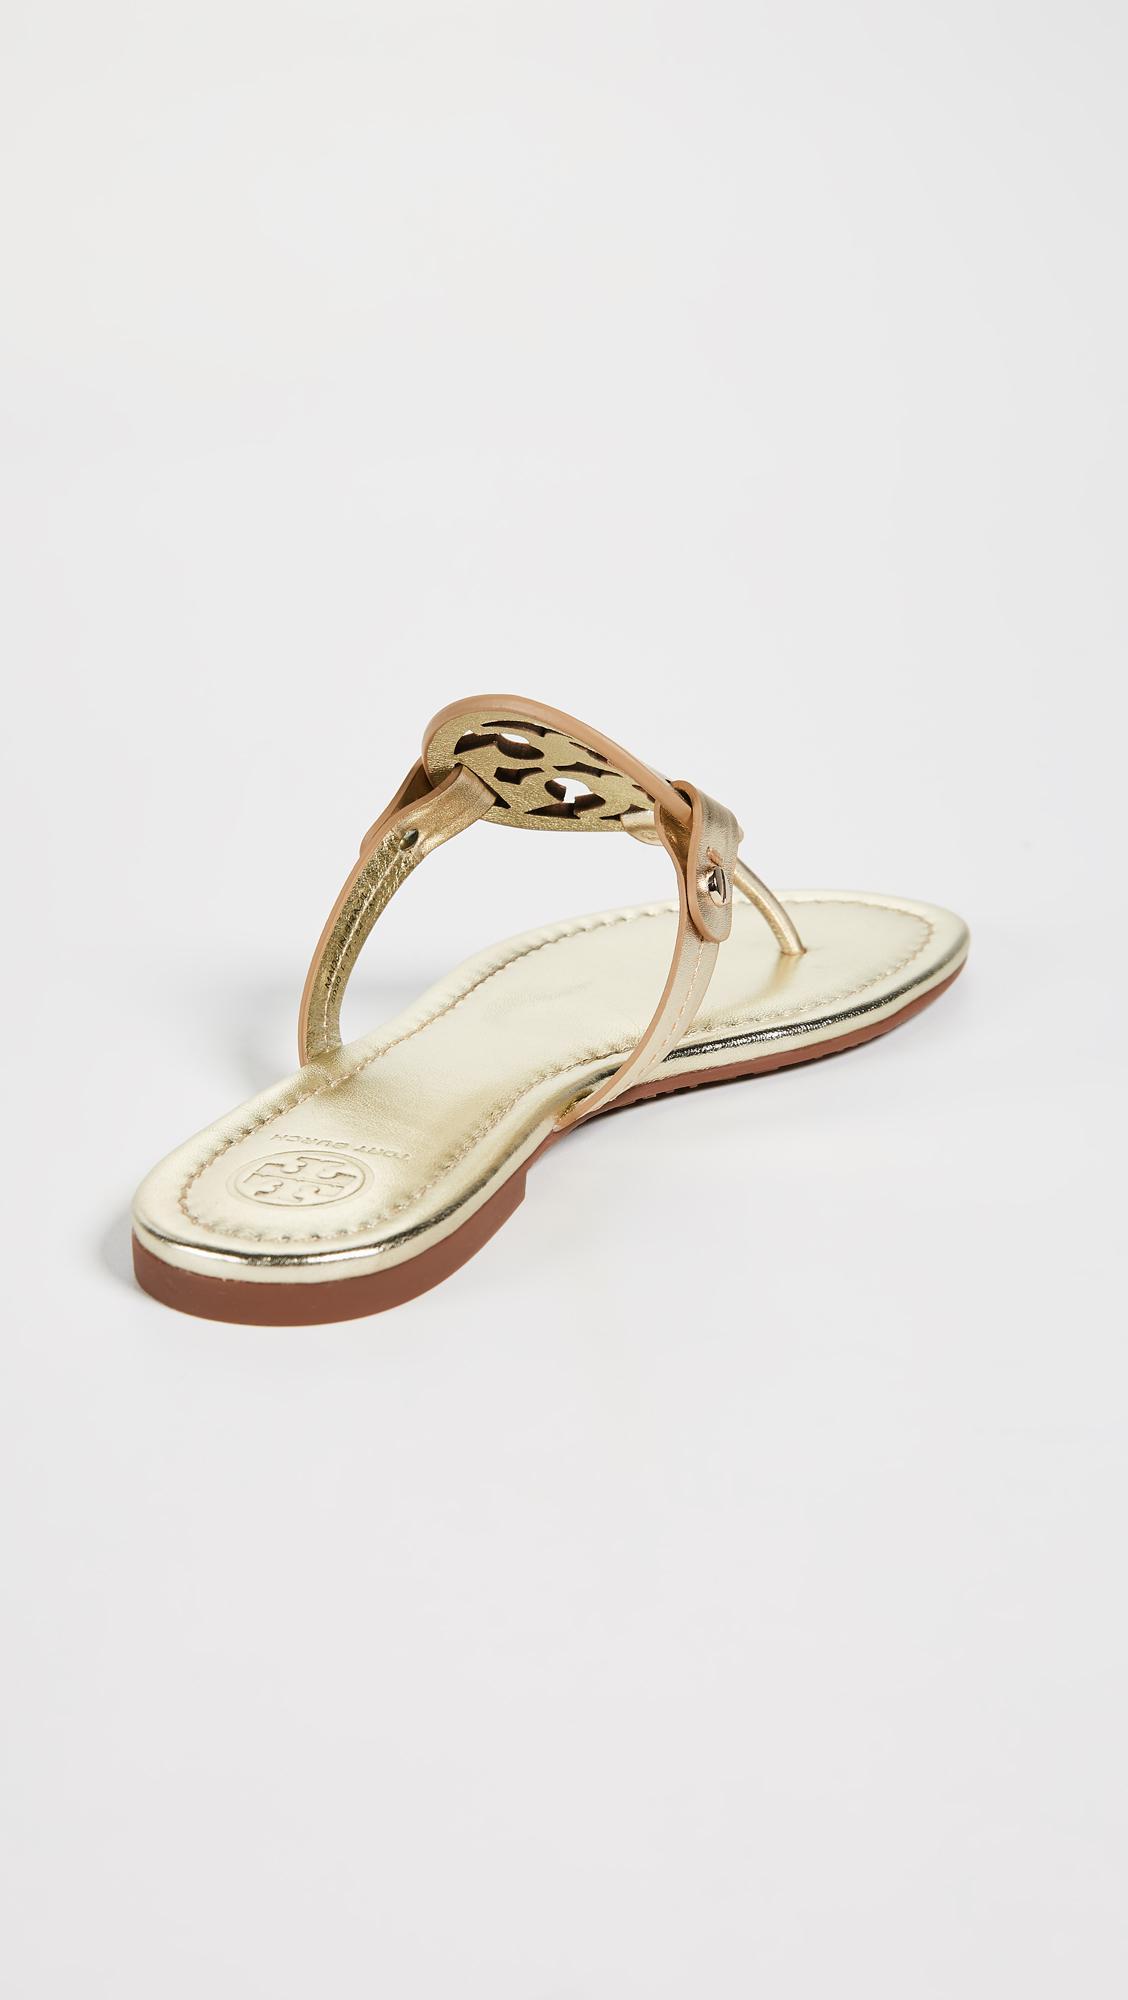 e32ba1862198ef Tory Burch - Multicolor Miller Thong Sandals - Lyst. View fullscreen